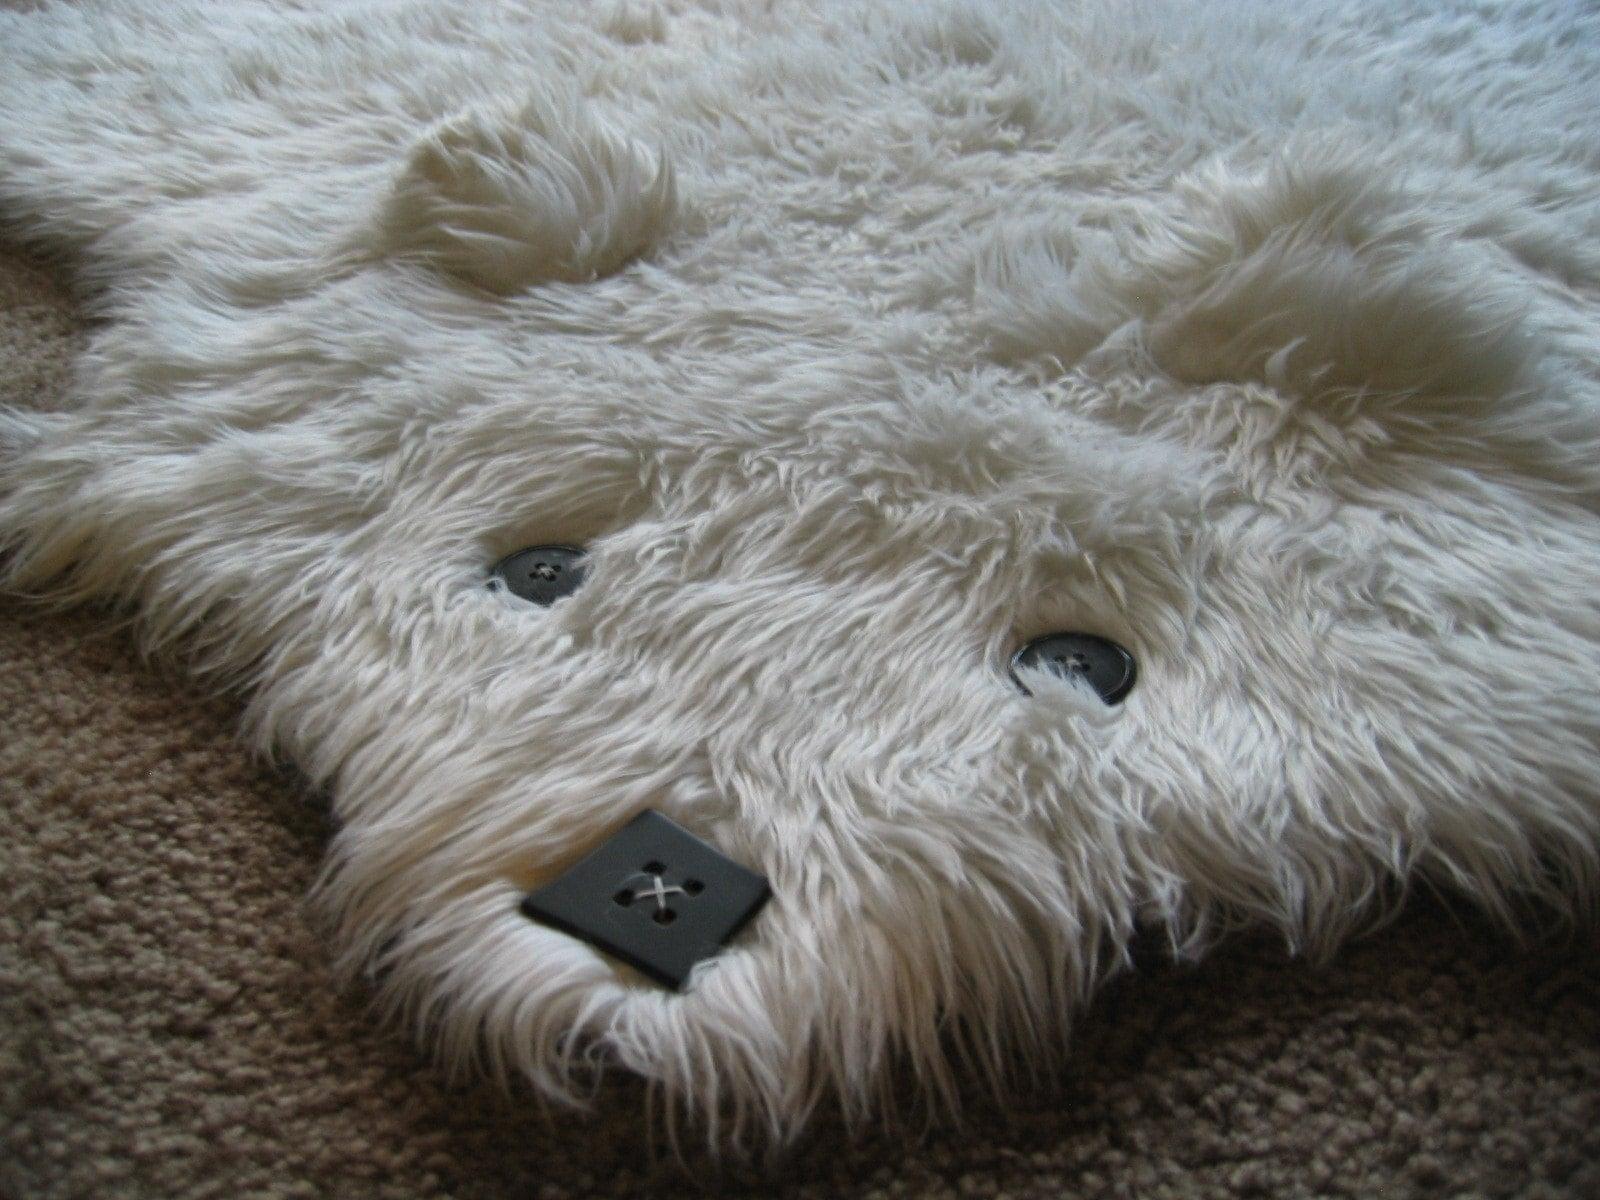 Rug sheepskin promotion bed mattress sale for Ikea bear rug